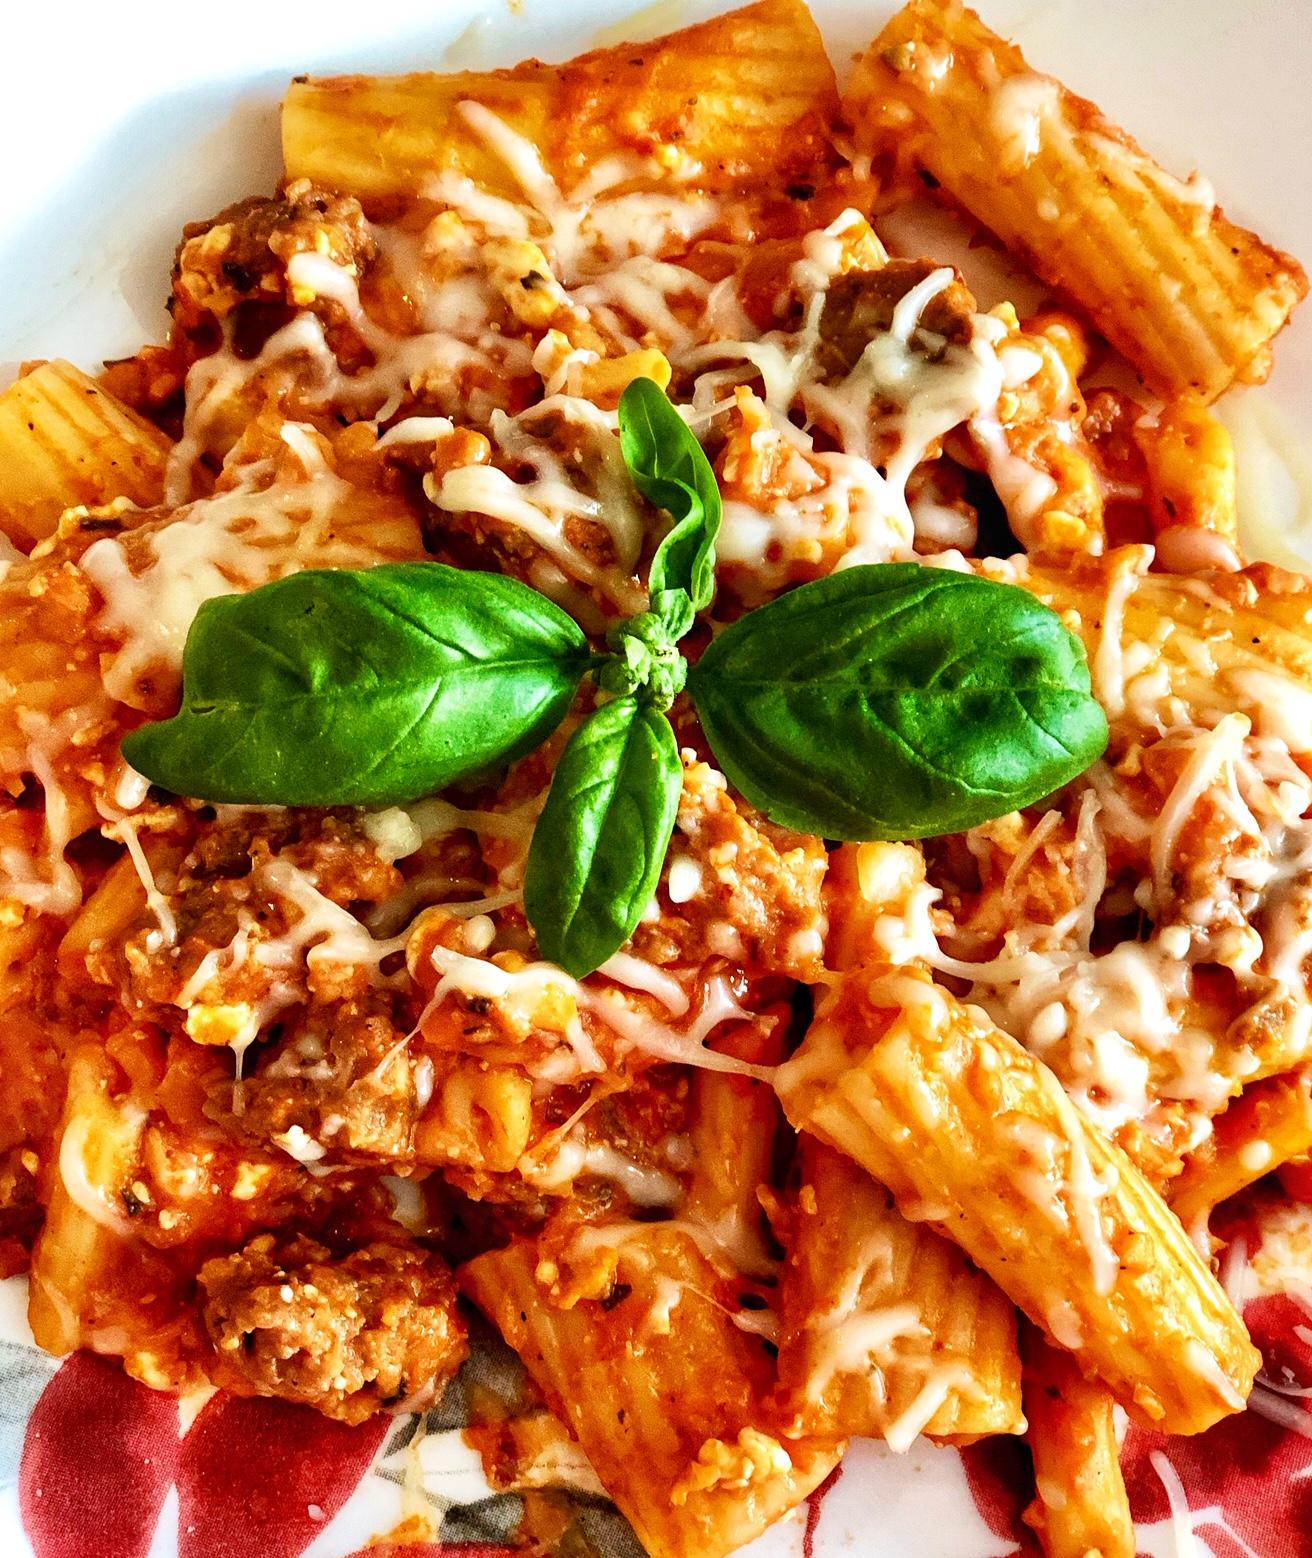 Easy Italian Sausage and Rigatoni